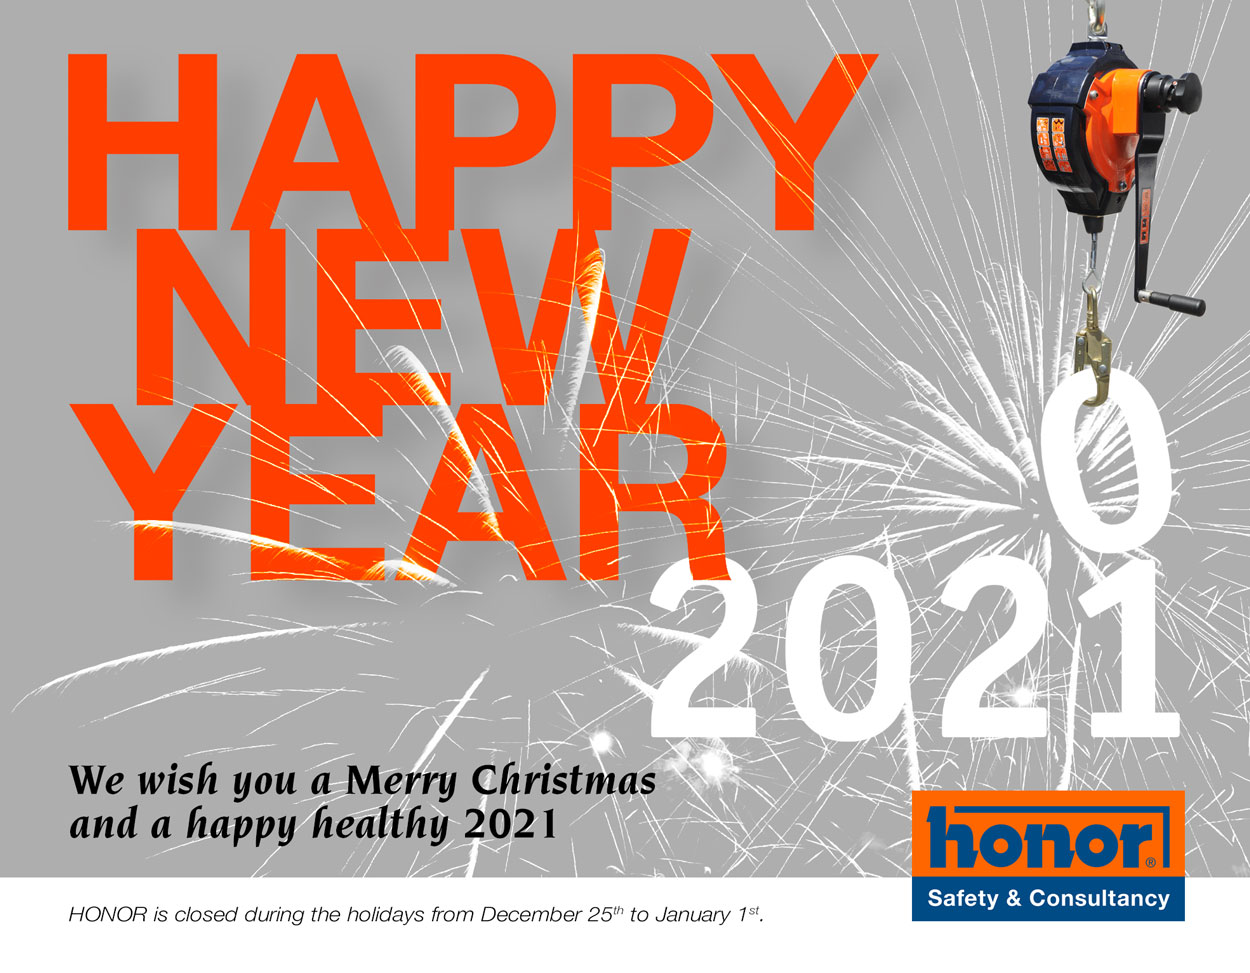 HappyNewYear-HONOR-Safety-2020-2021-UK